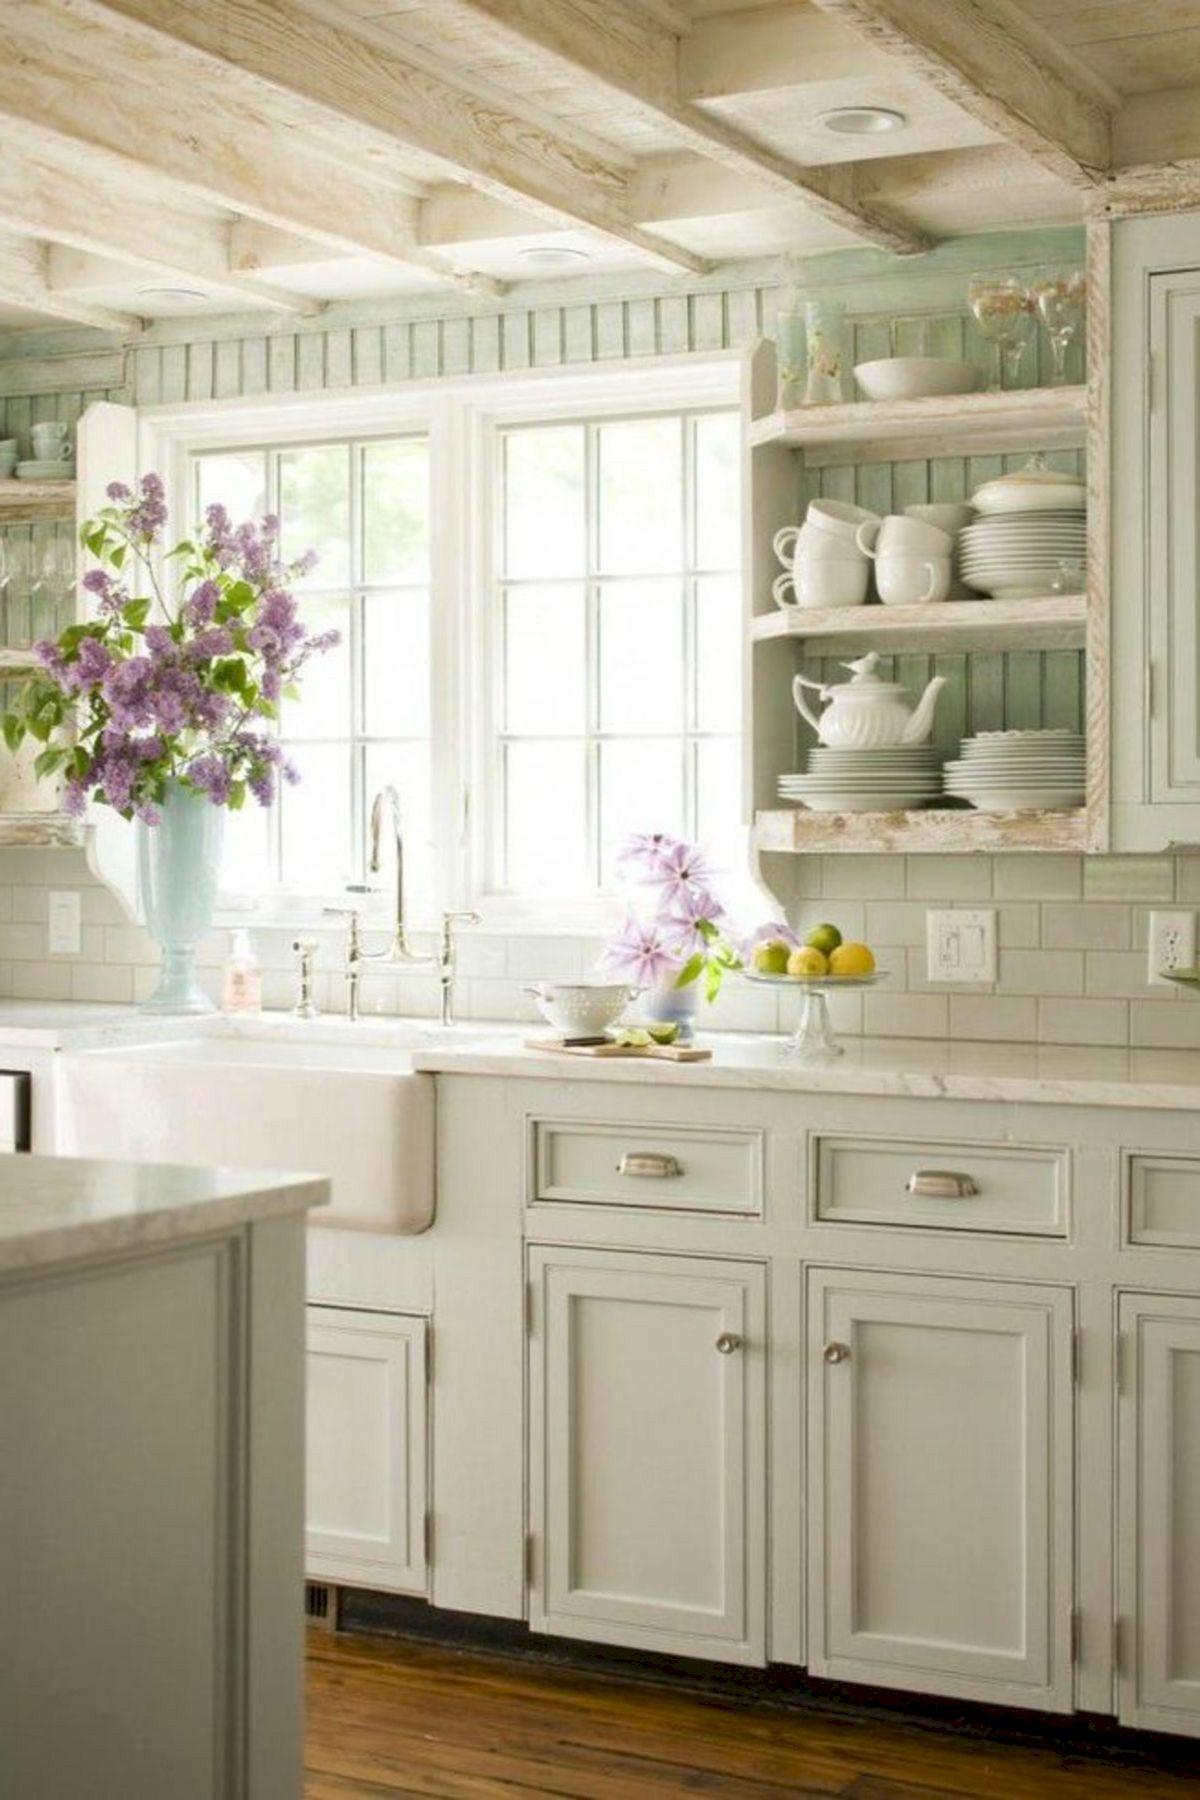 50 Cozy Farmhouse Kitchen Design And Decor Ideas (2)